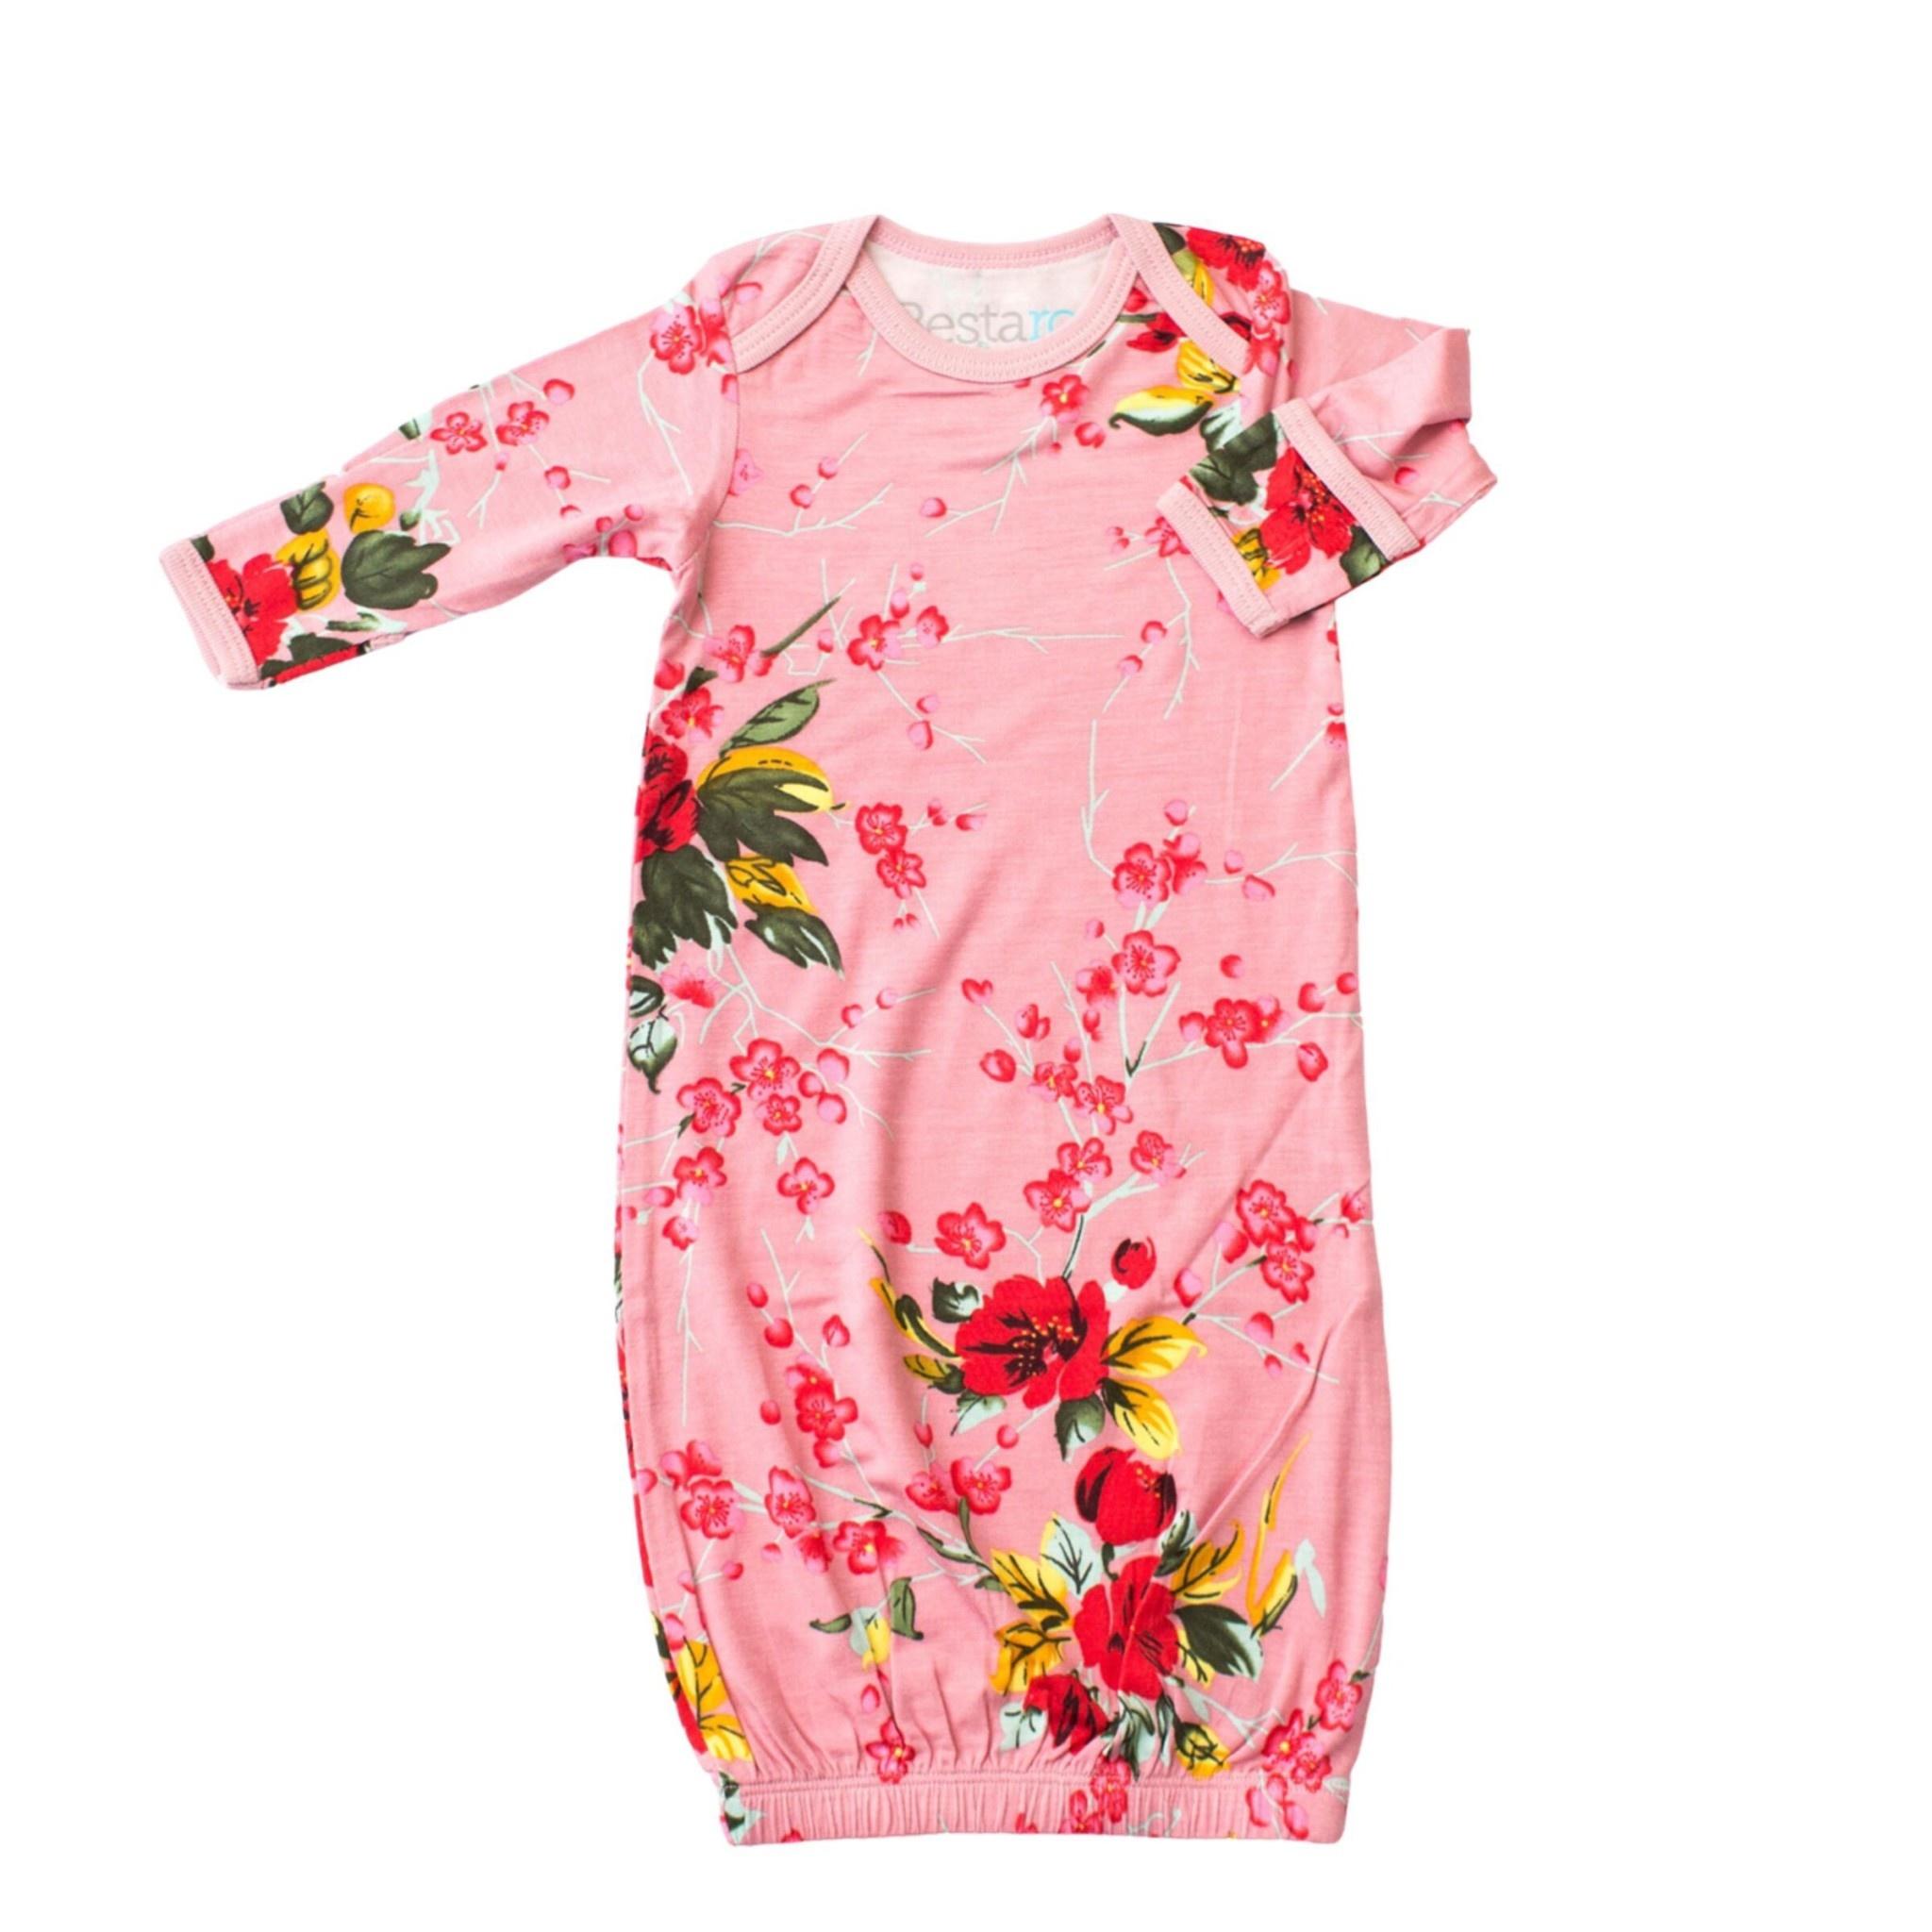 Bestaroo Cherry Blossom Gown - Rose 0-3M